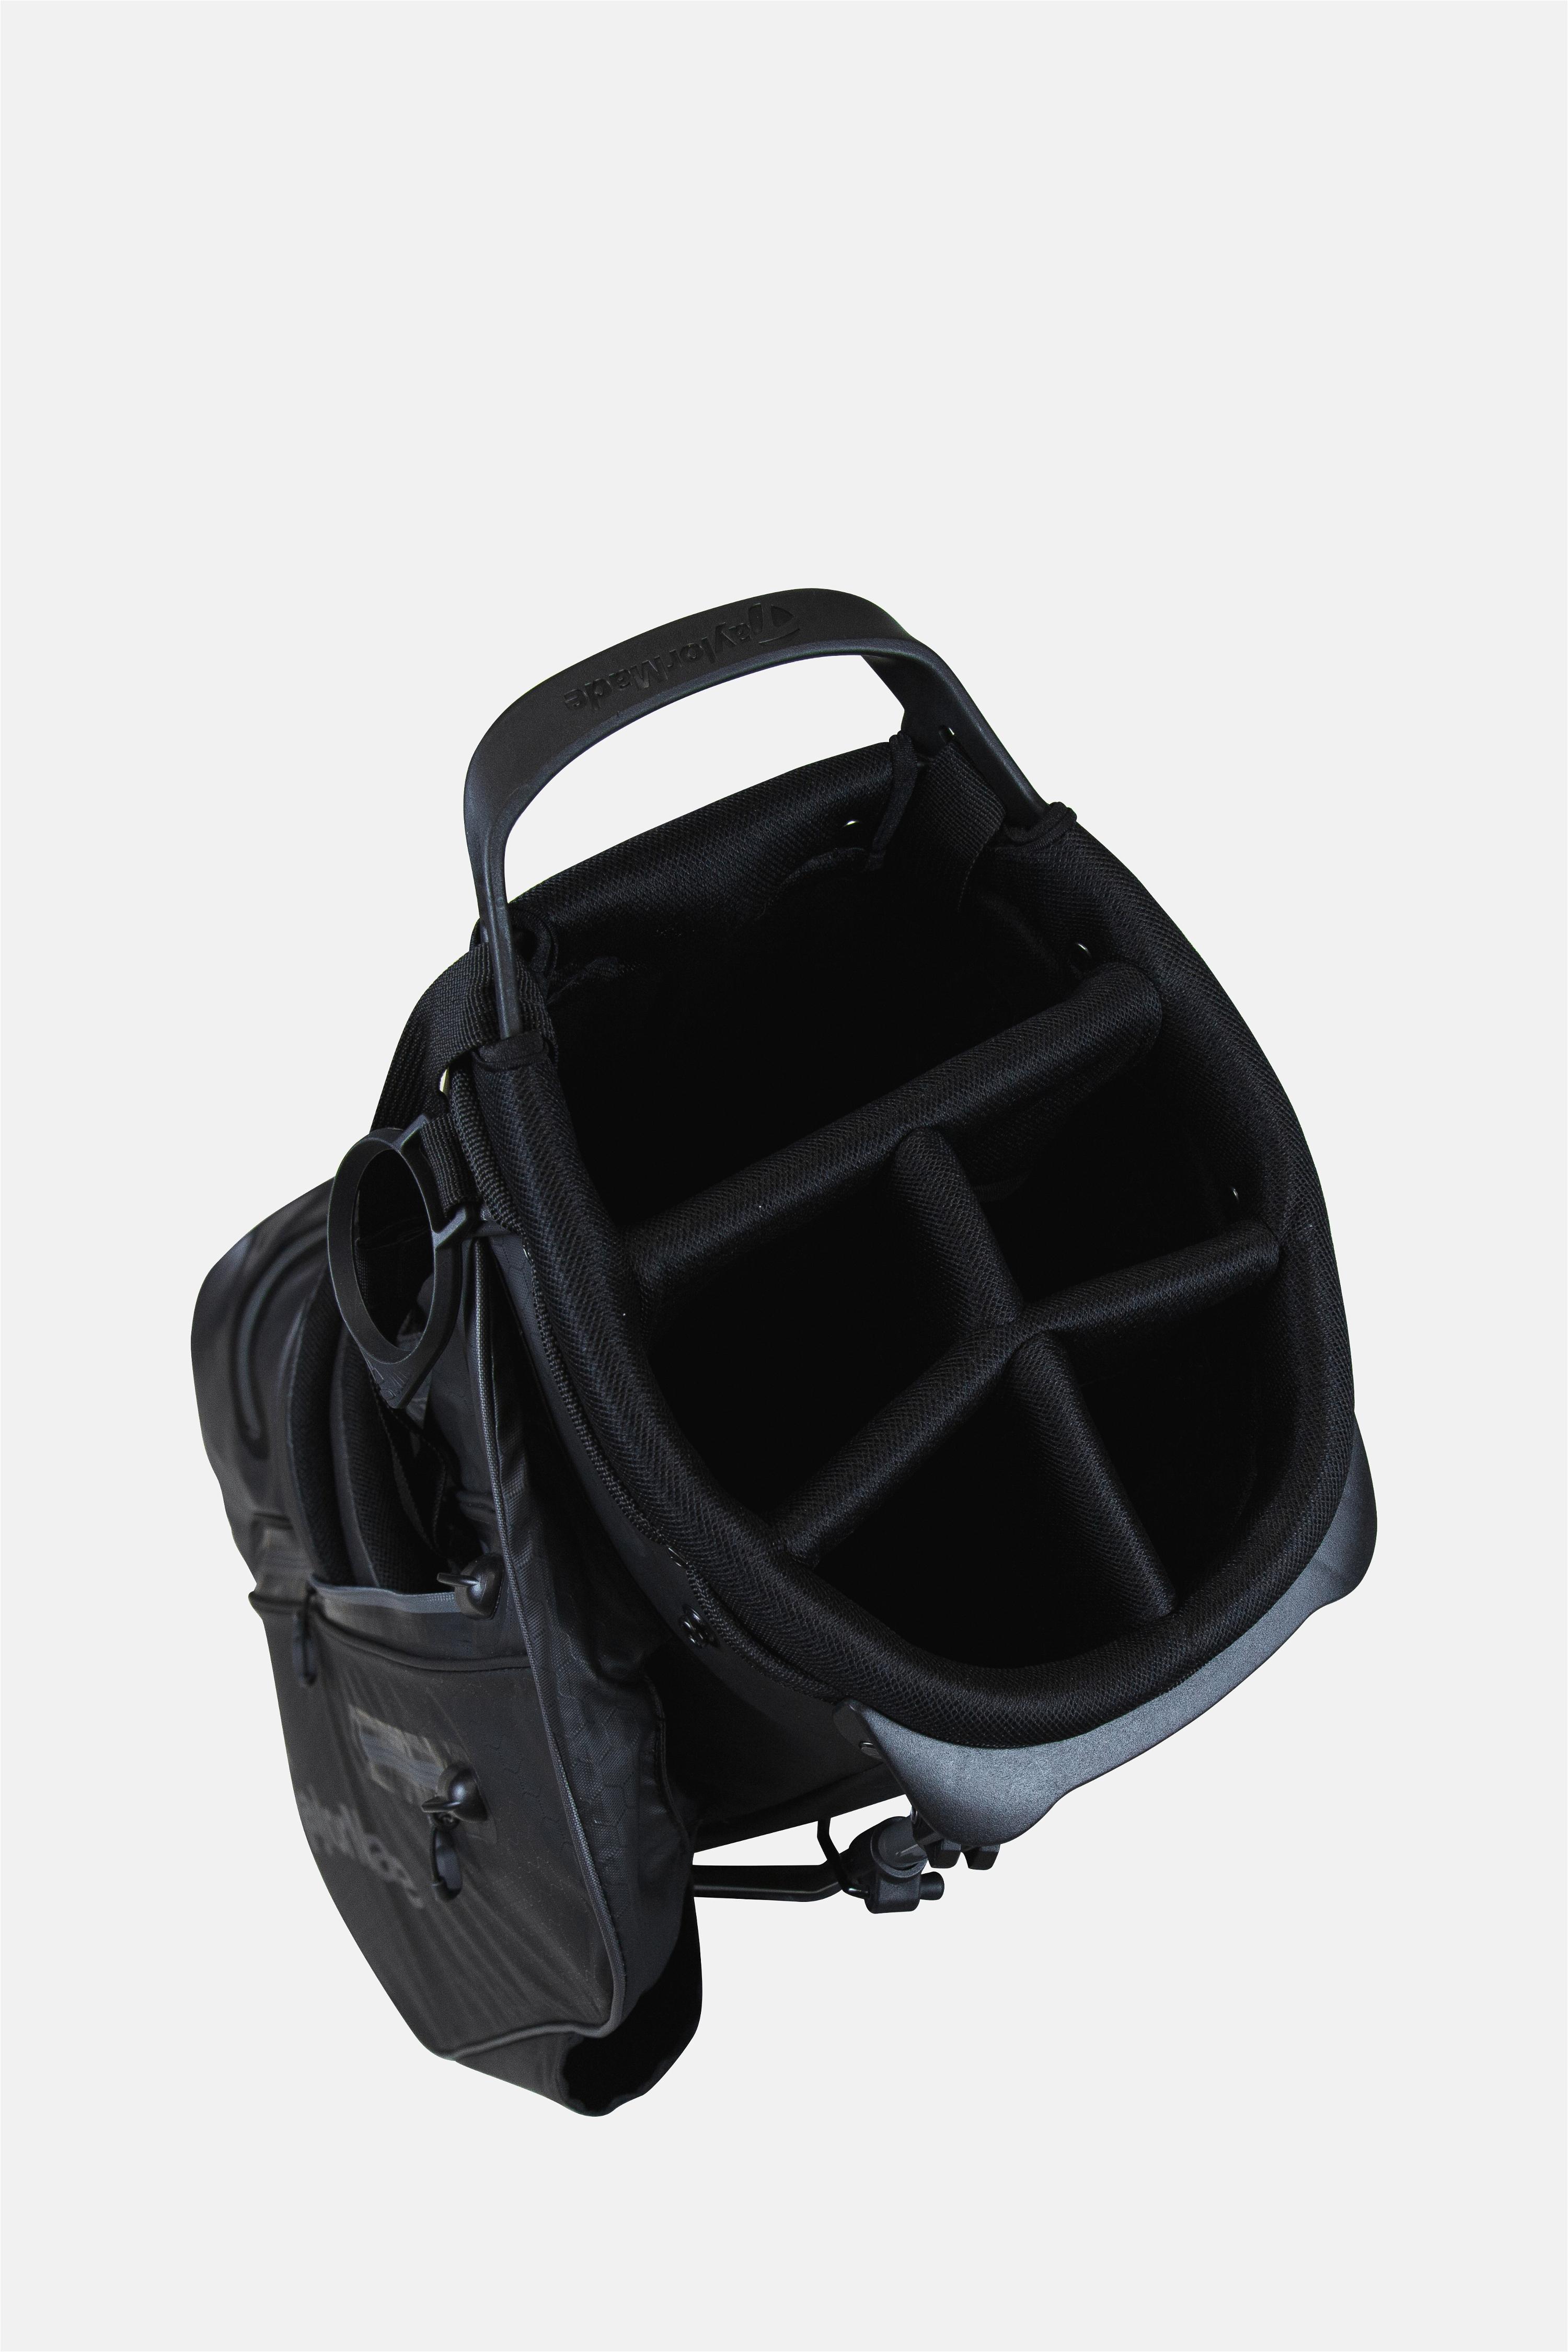 Flextech Waterproof Carry